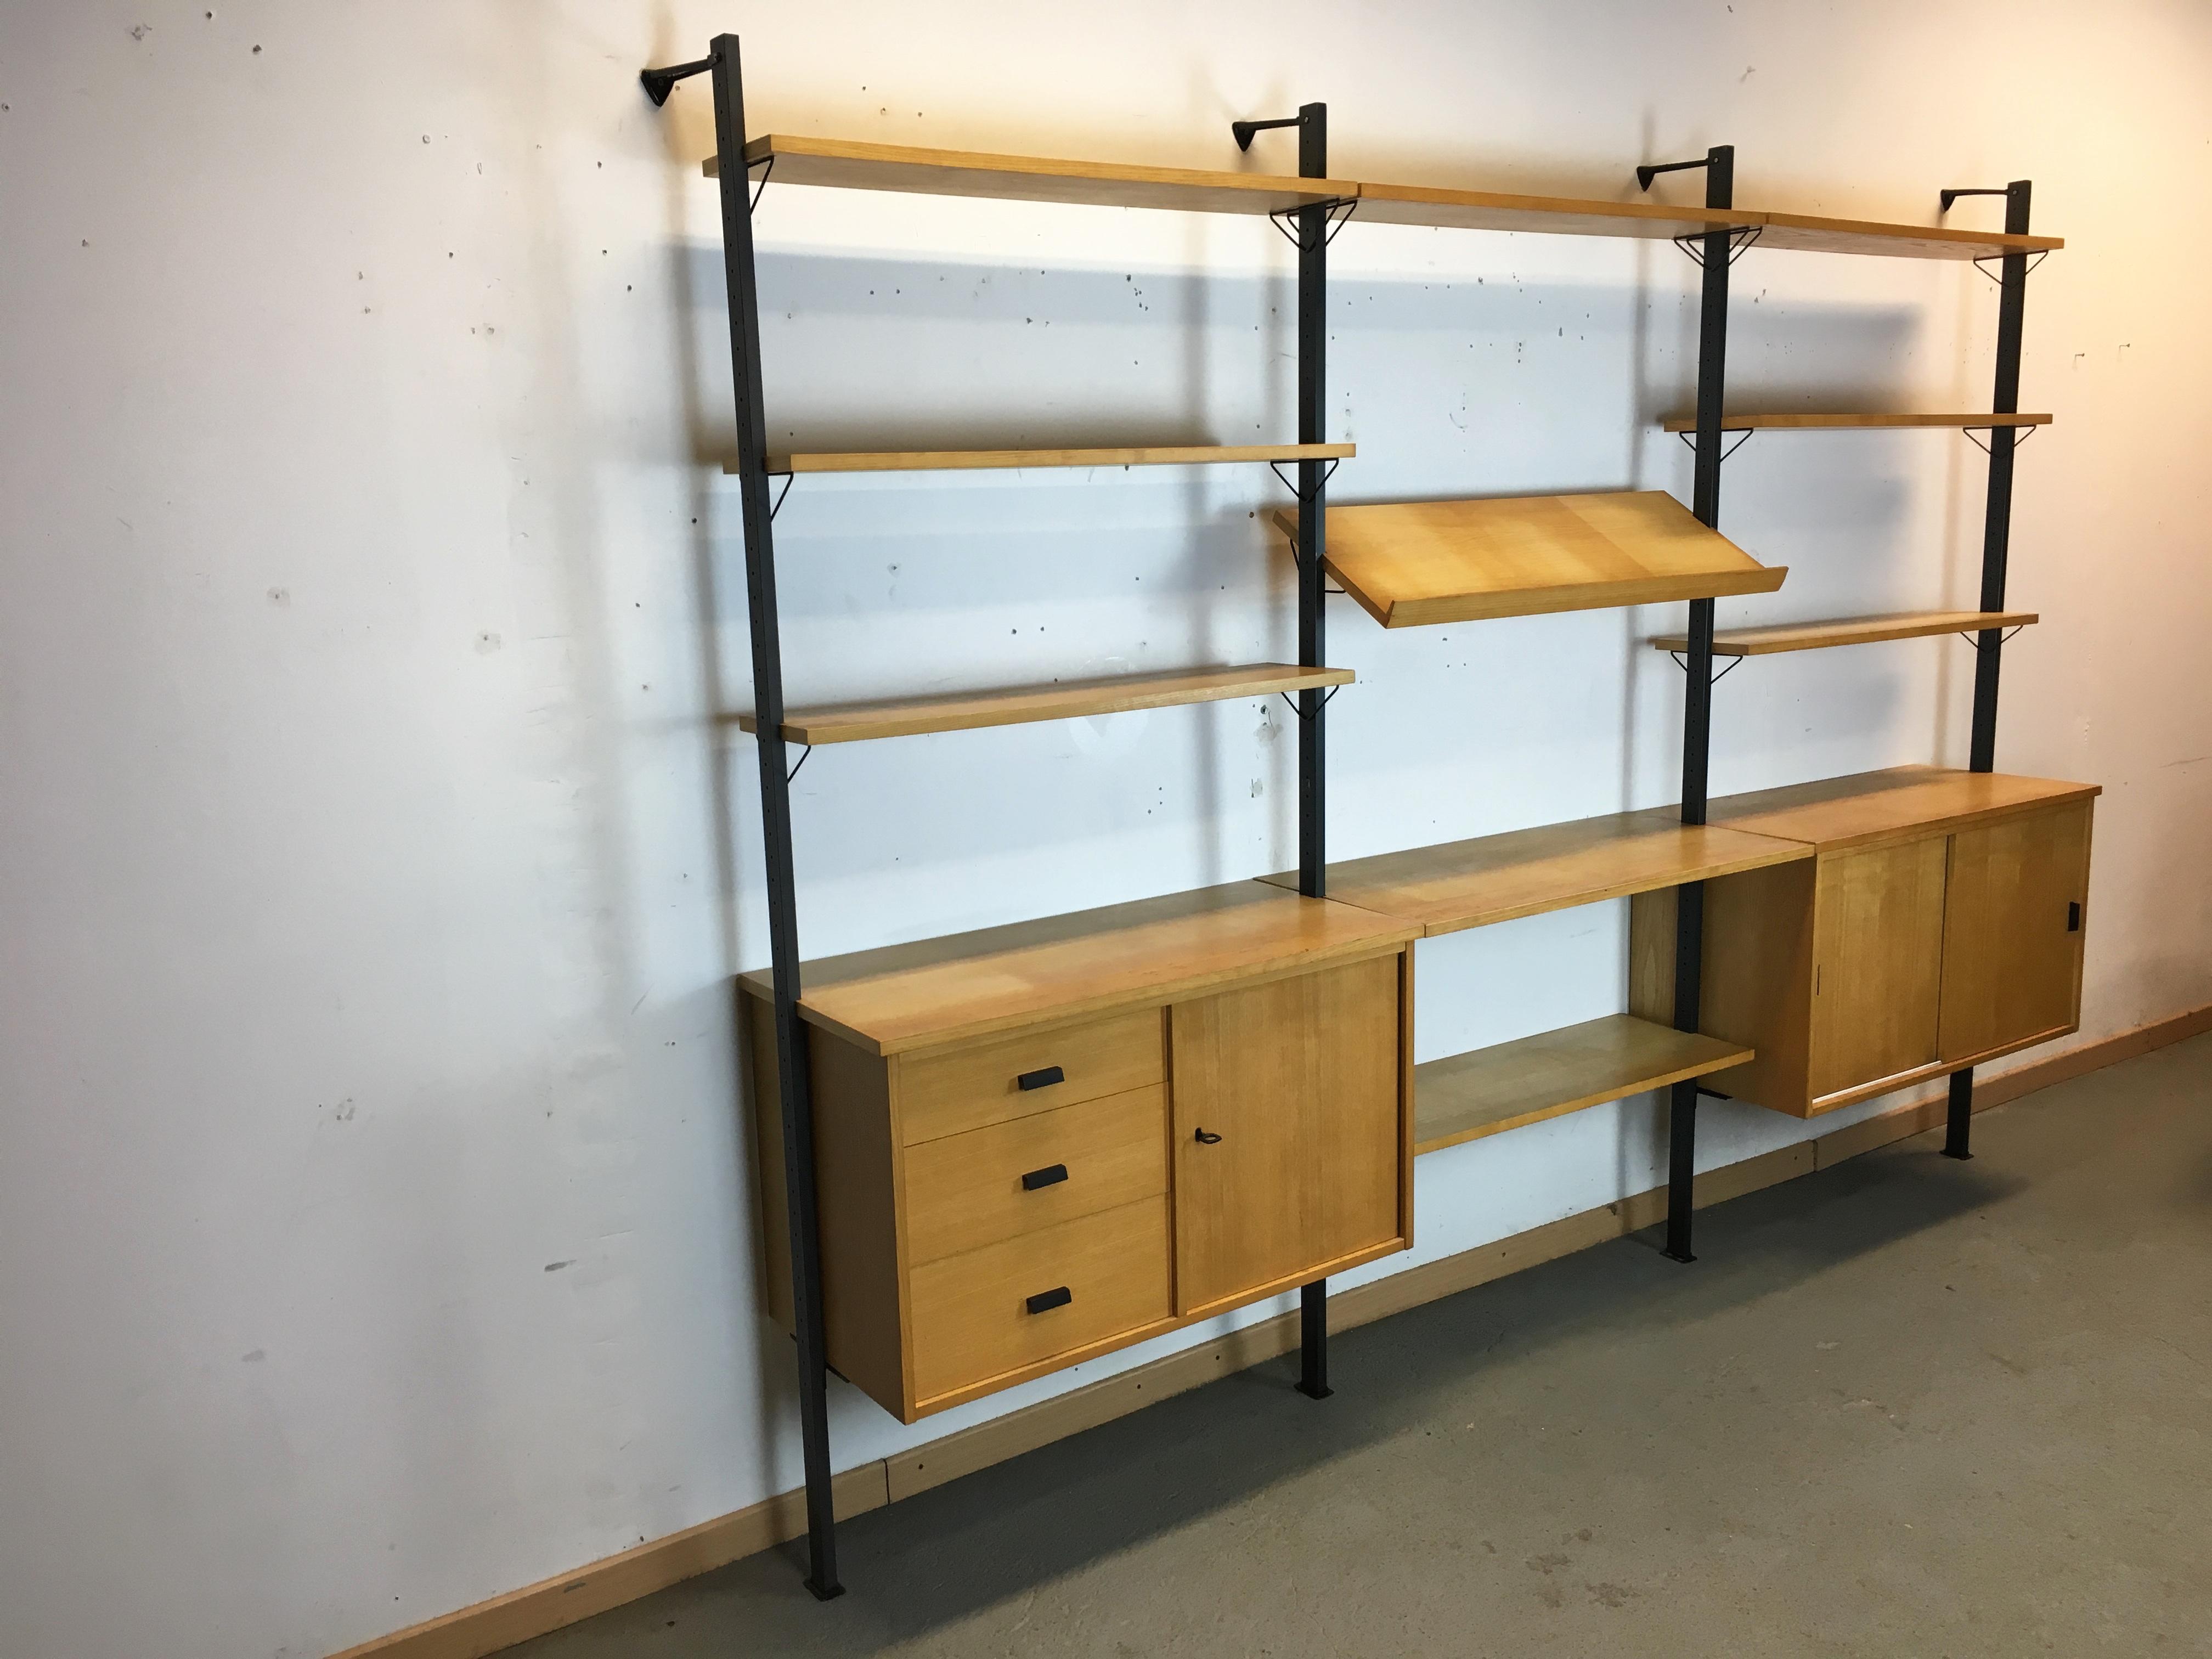 etag re biblioth que scandinave pira ann e 60 pira shelf system wall unit. Black Bedroom Furniture Sets. Home Design Ideas